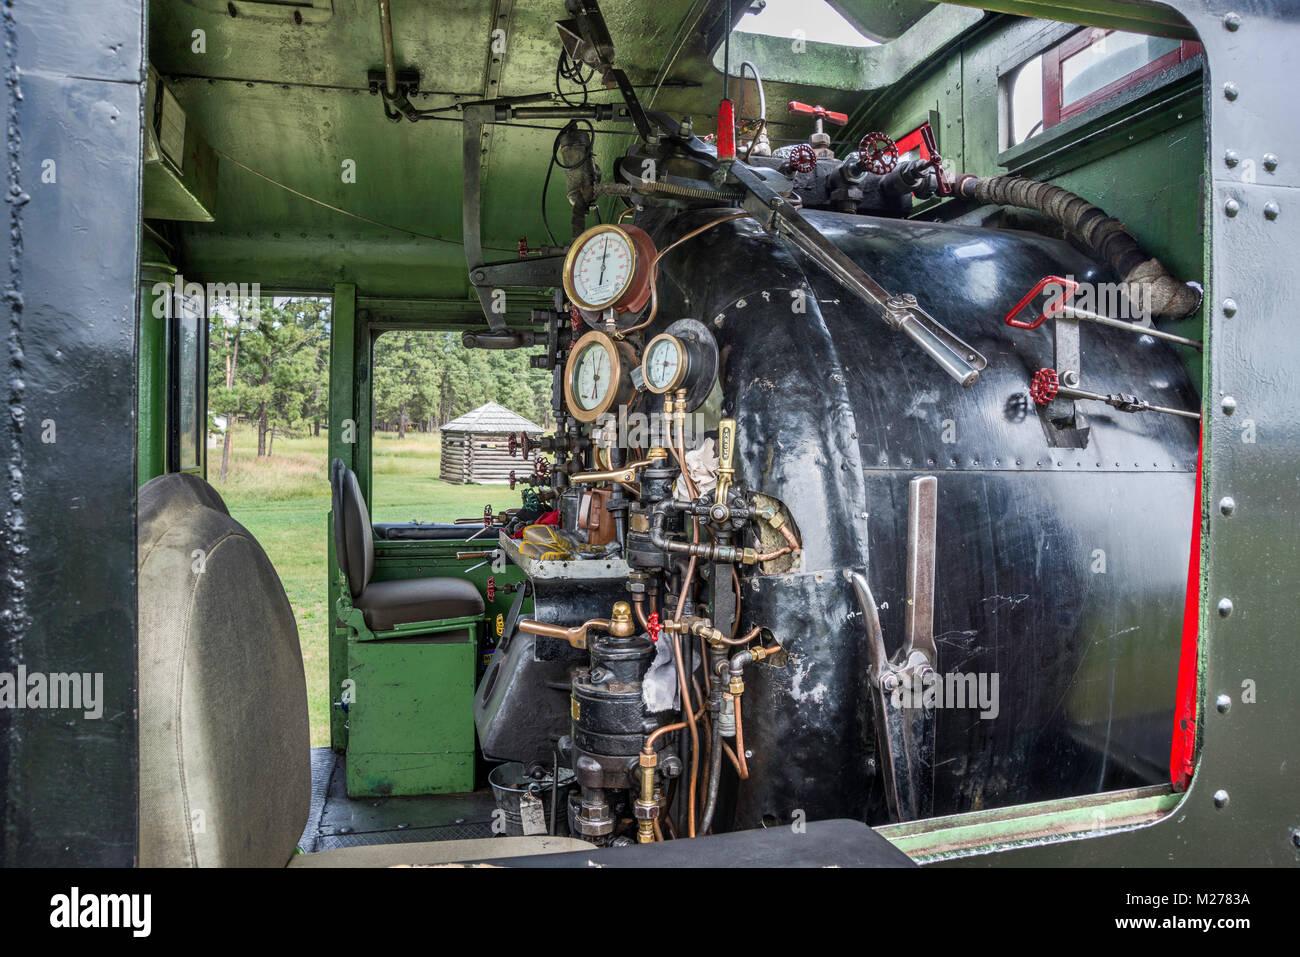 Cab der Dampflok Nr. 1077, 1923 erbaut, am Fort Steele Erbe der Stadt, East Kootenay Region, British Columbia, Kanada Stockbild